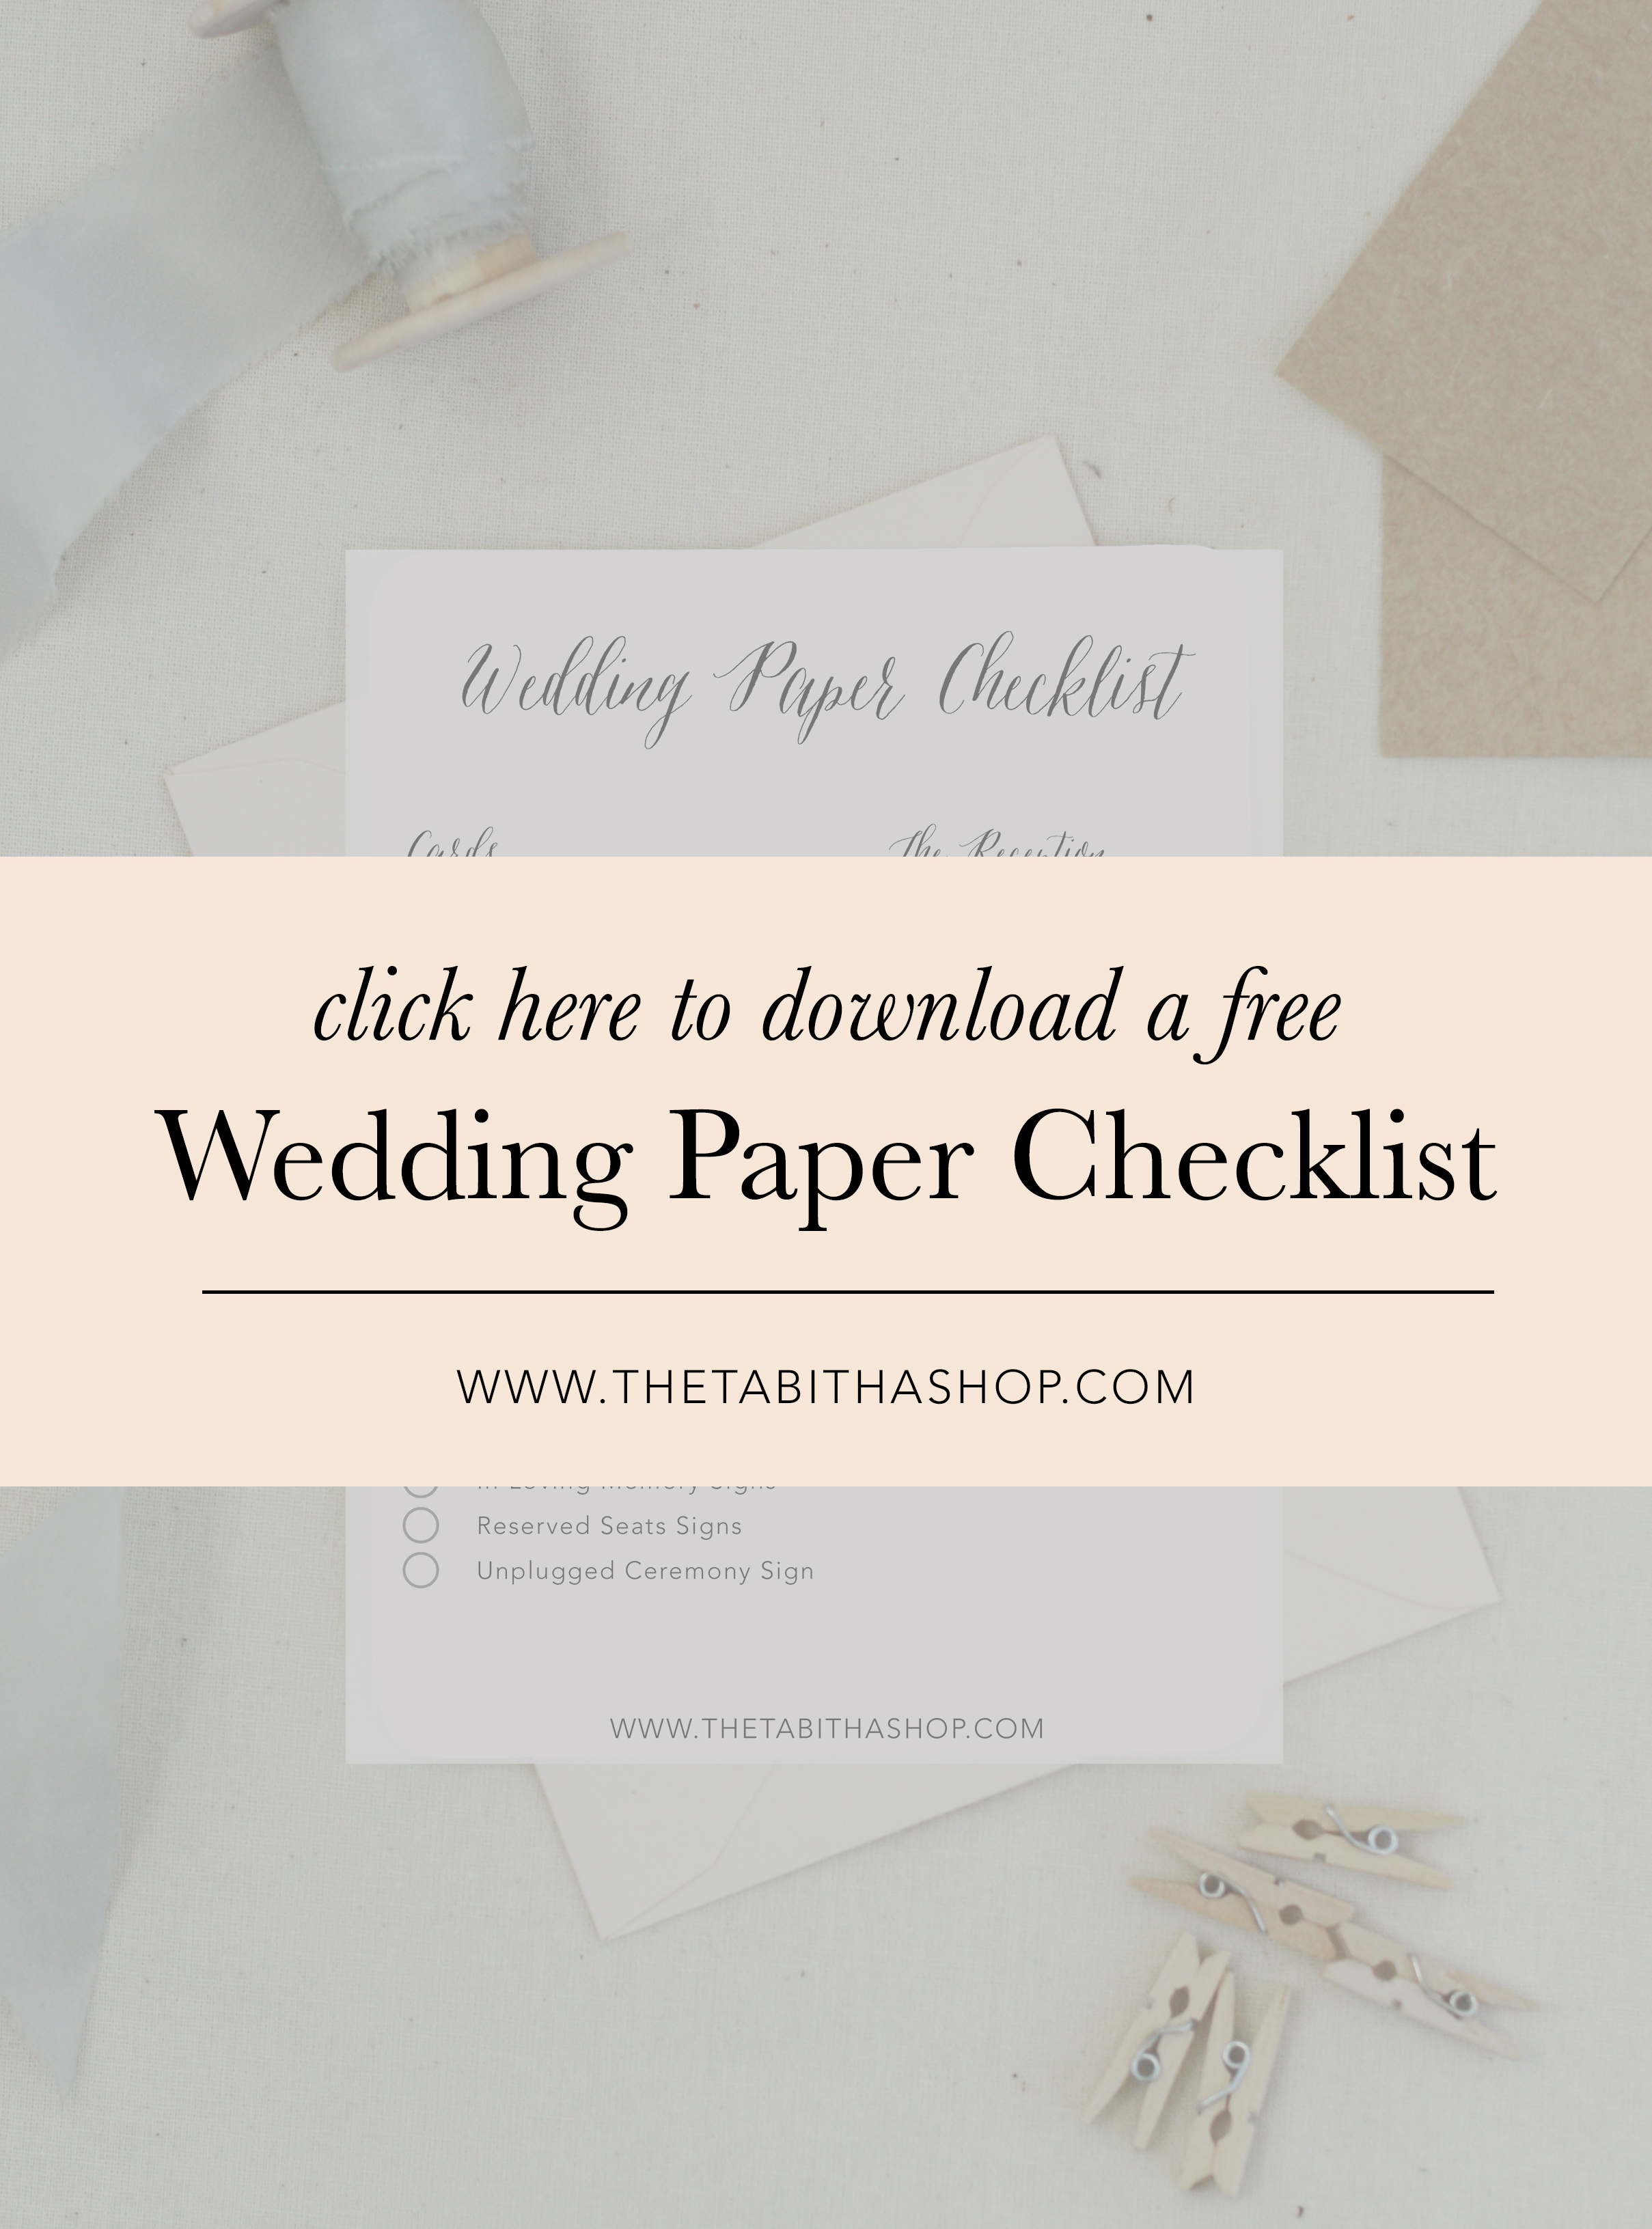 stationery checklist